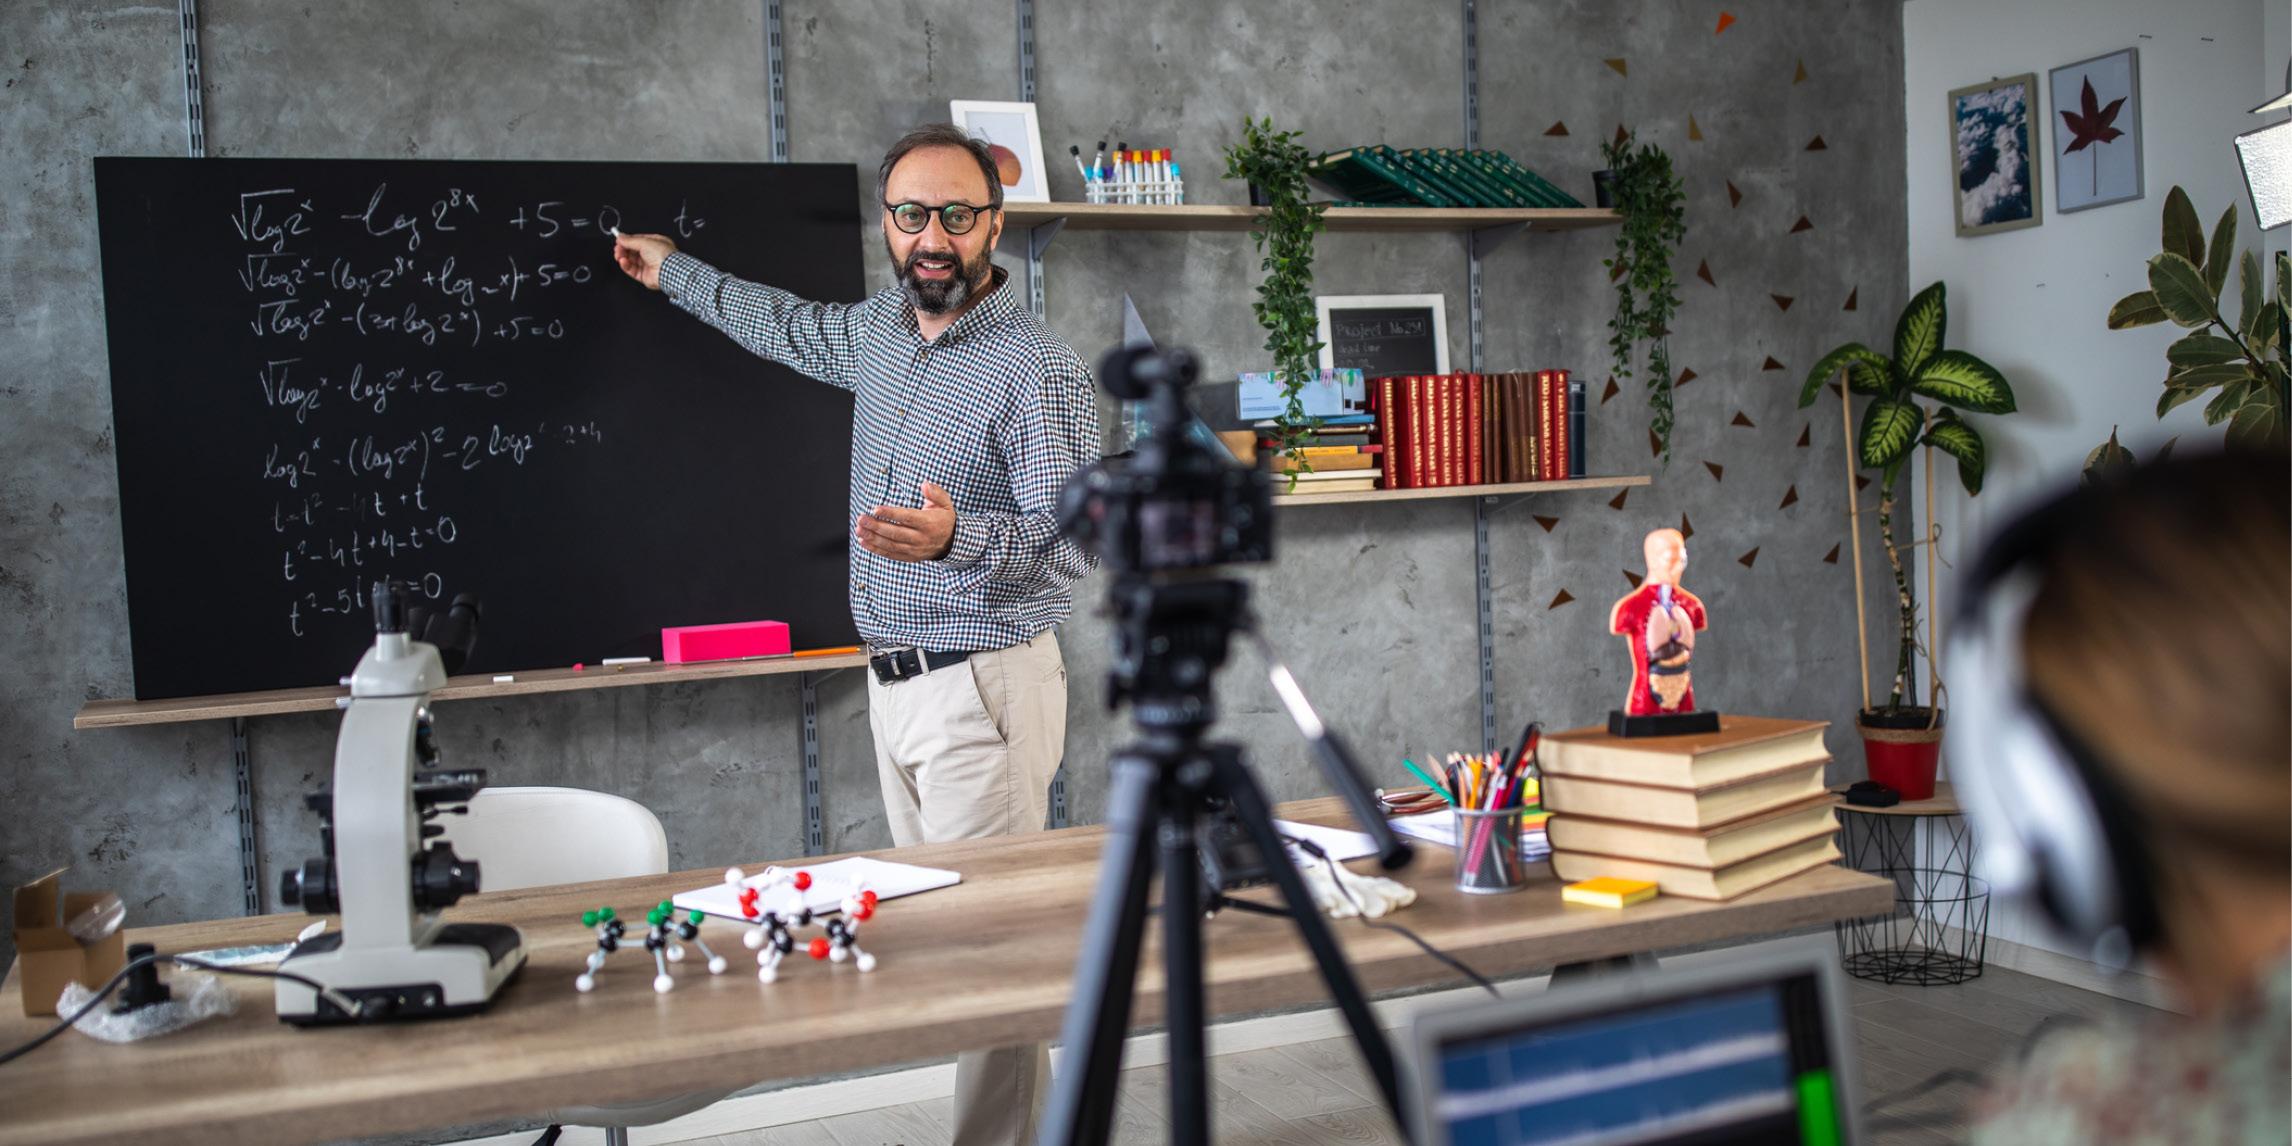 A teacher recording a lecture